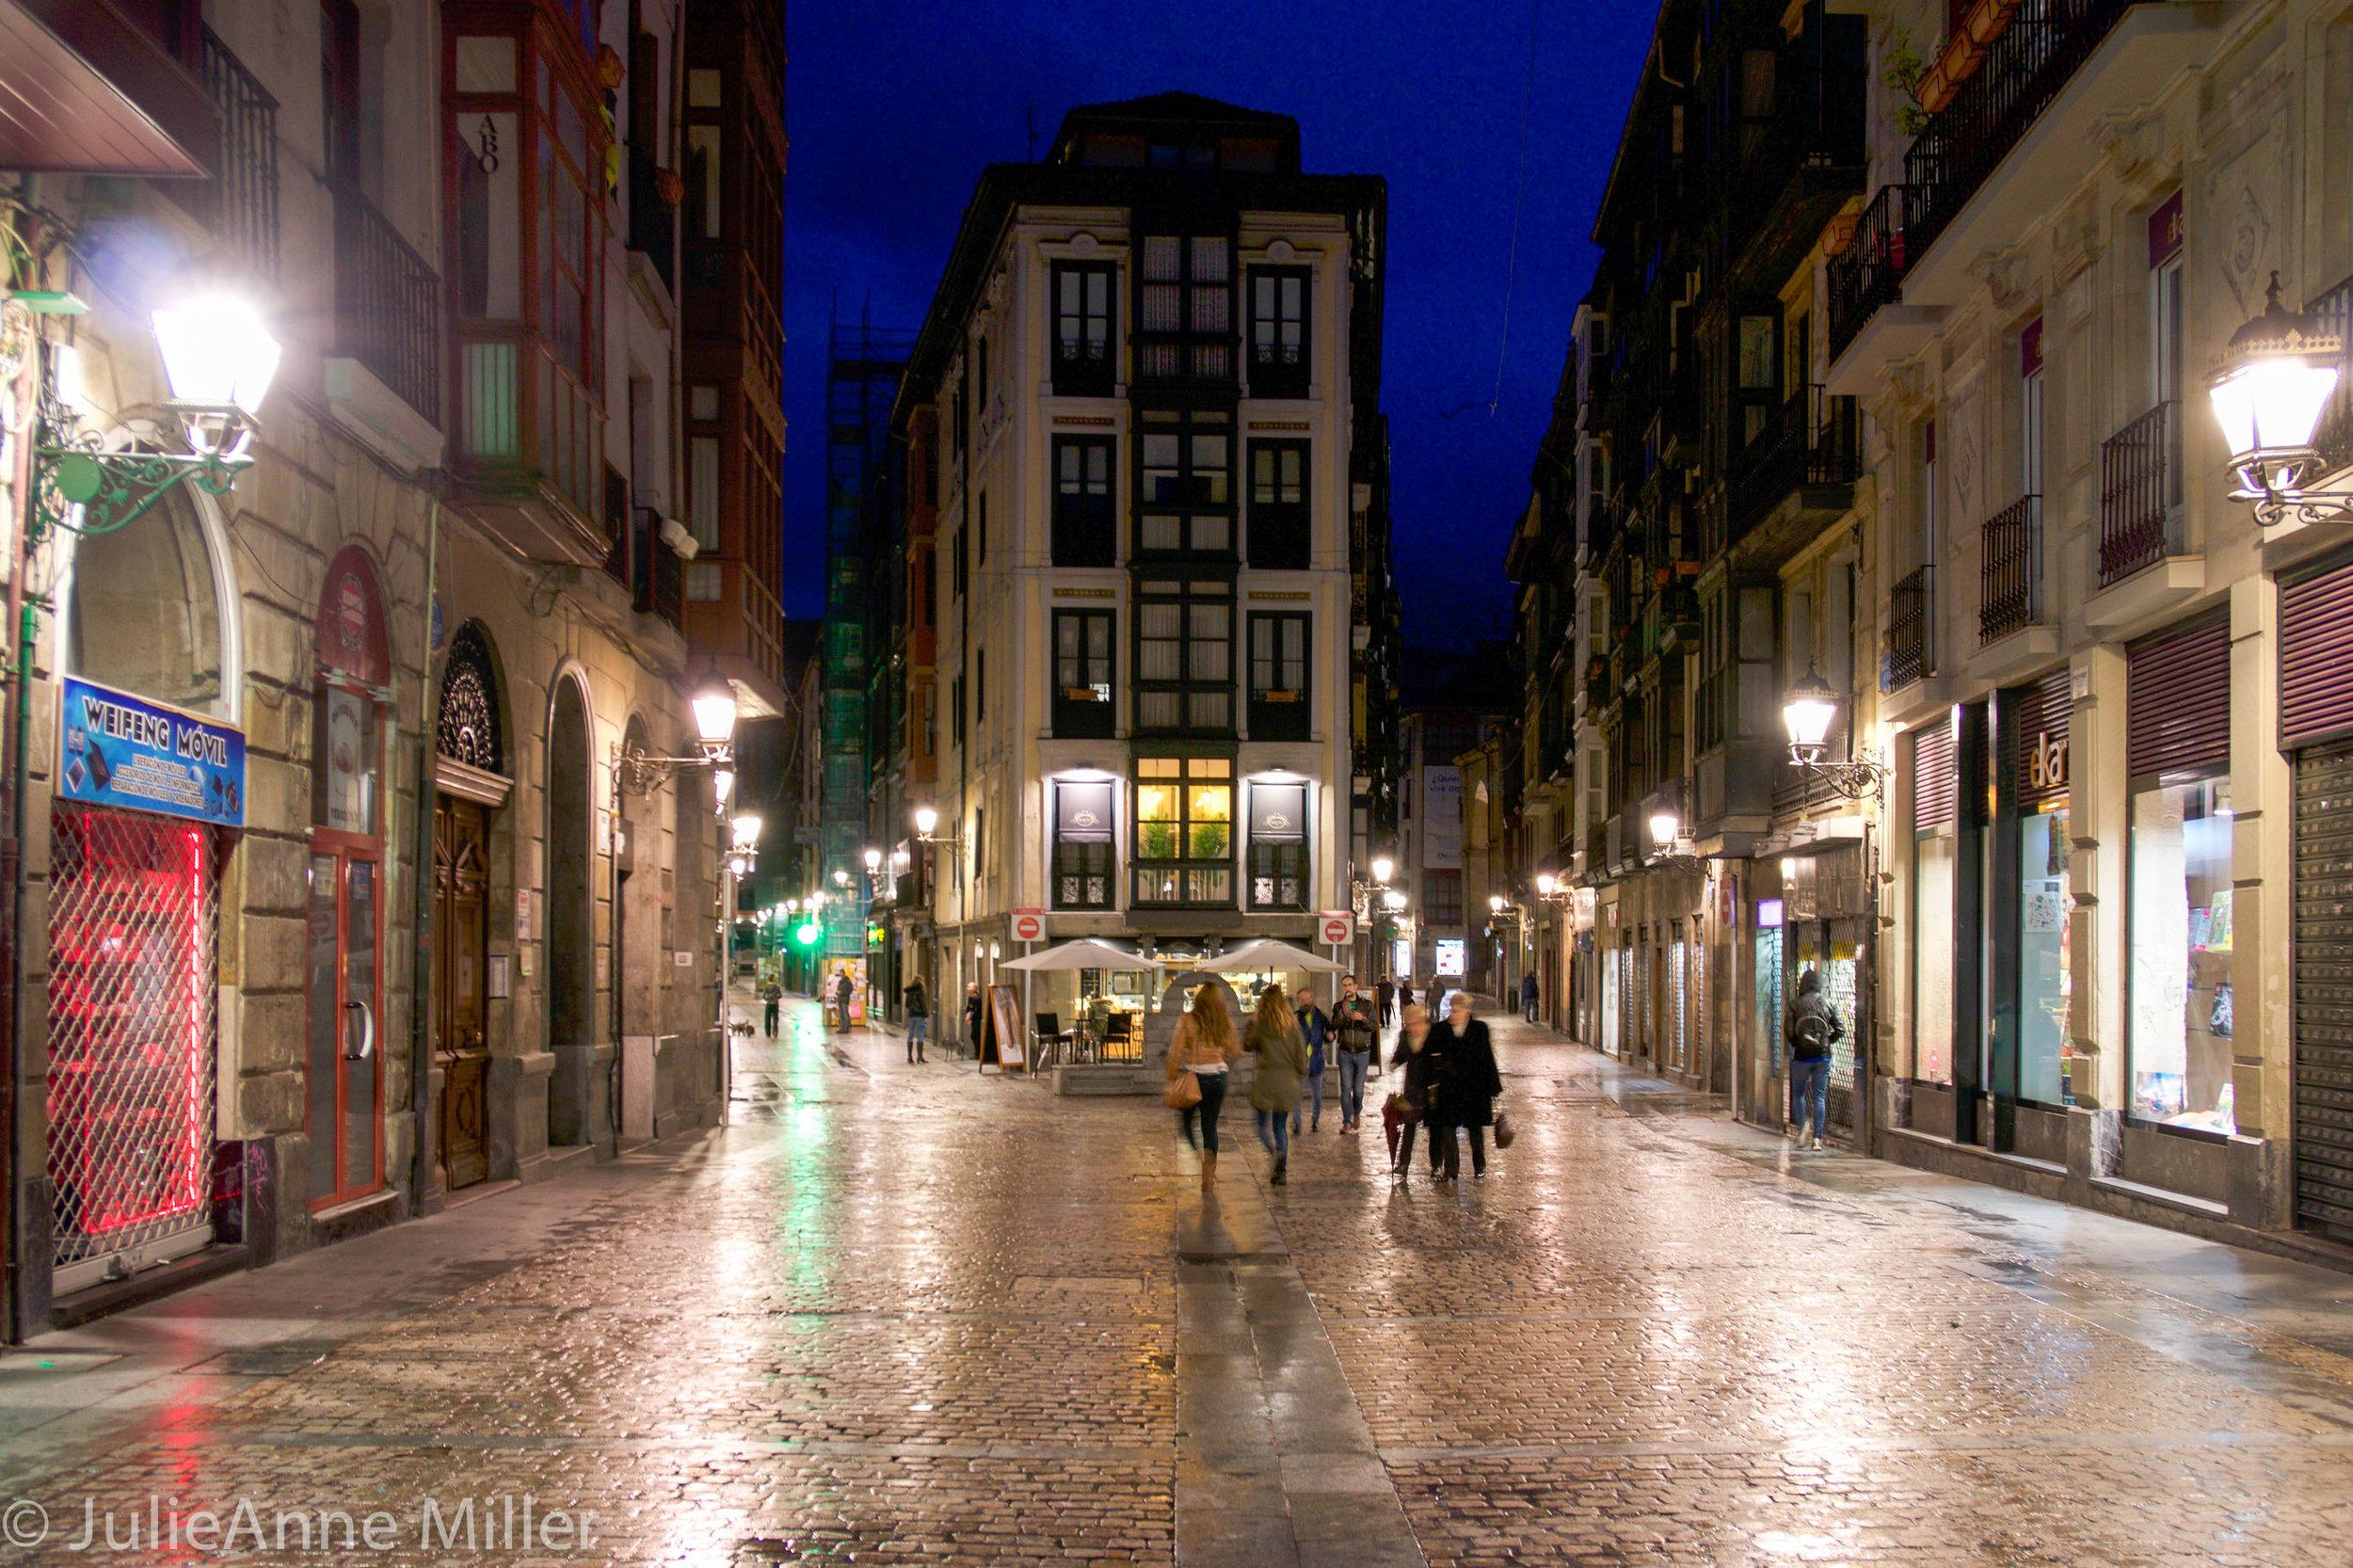 Bilbao, Basque